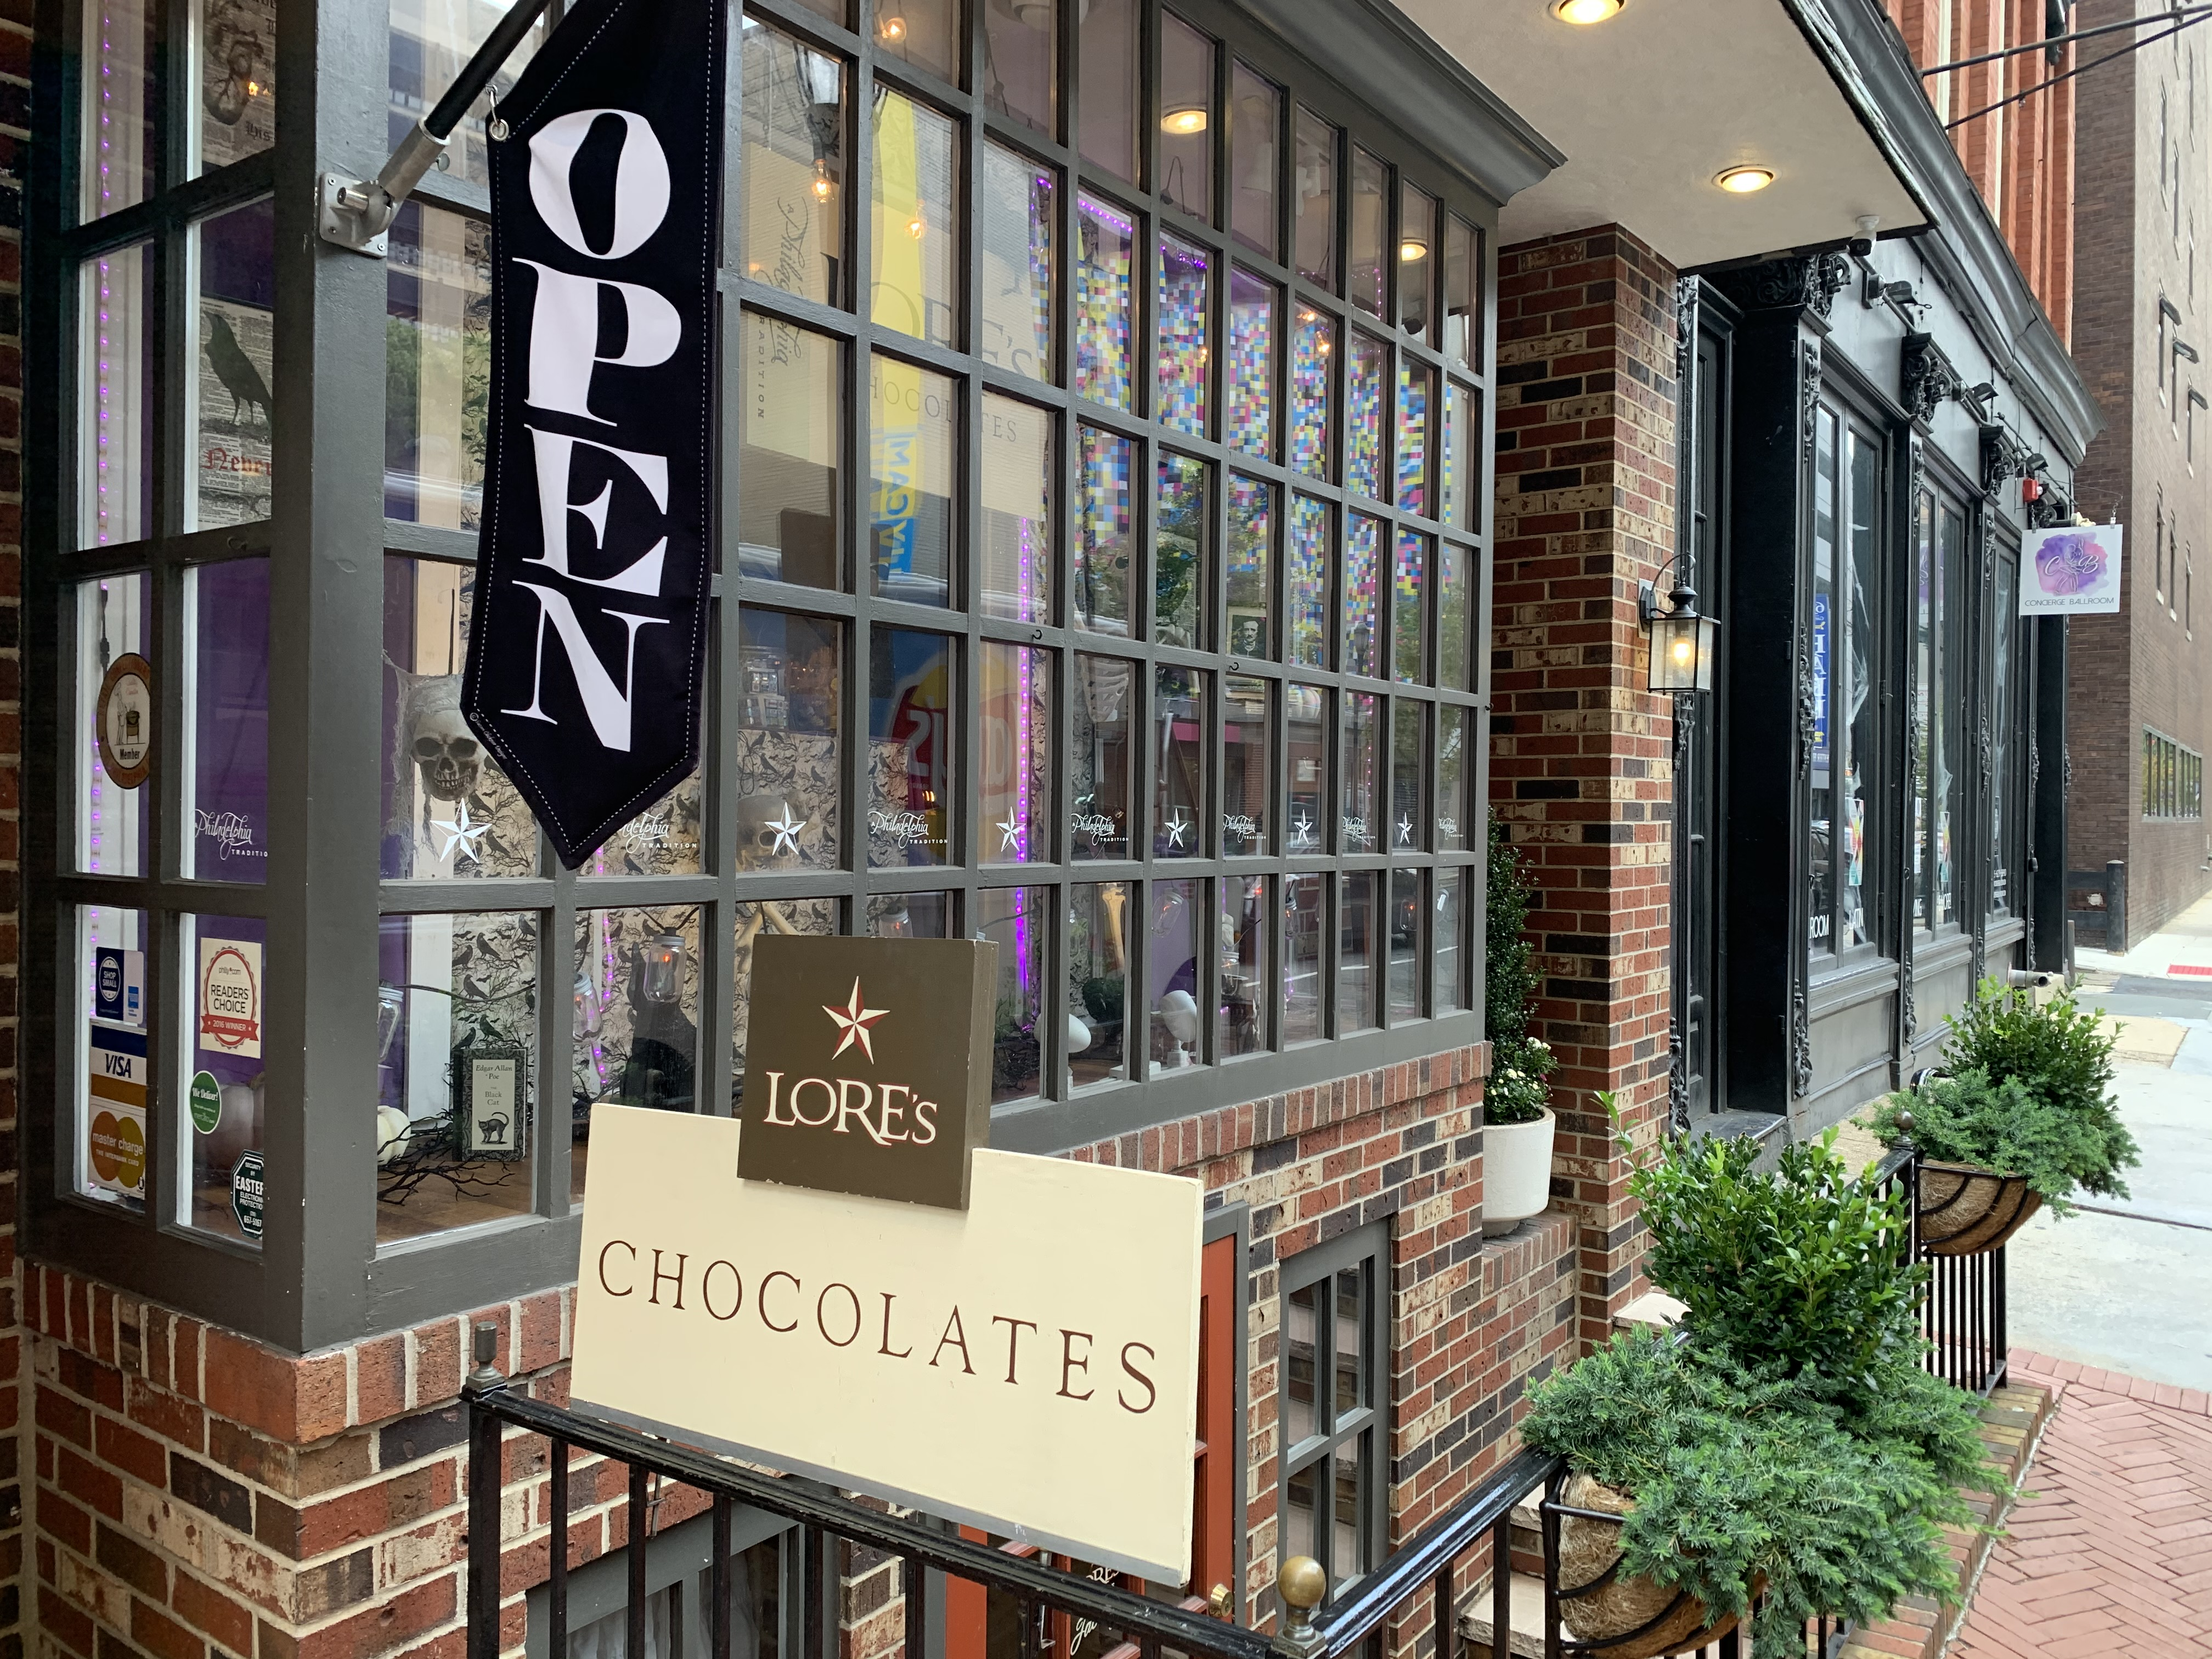 Lore's Chocolates